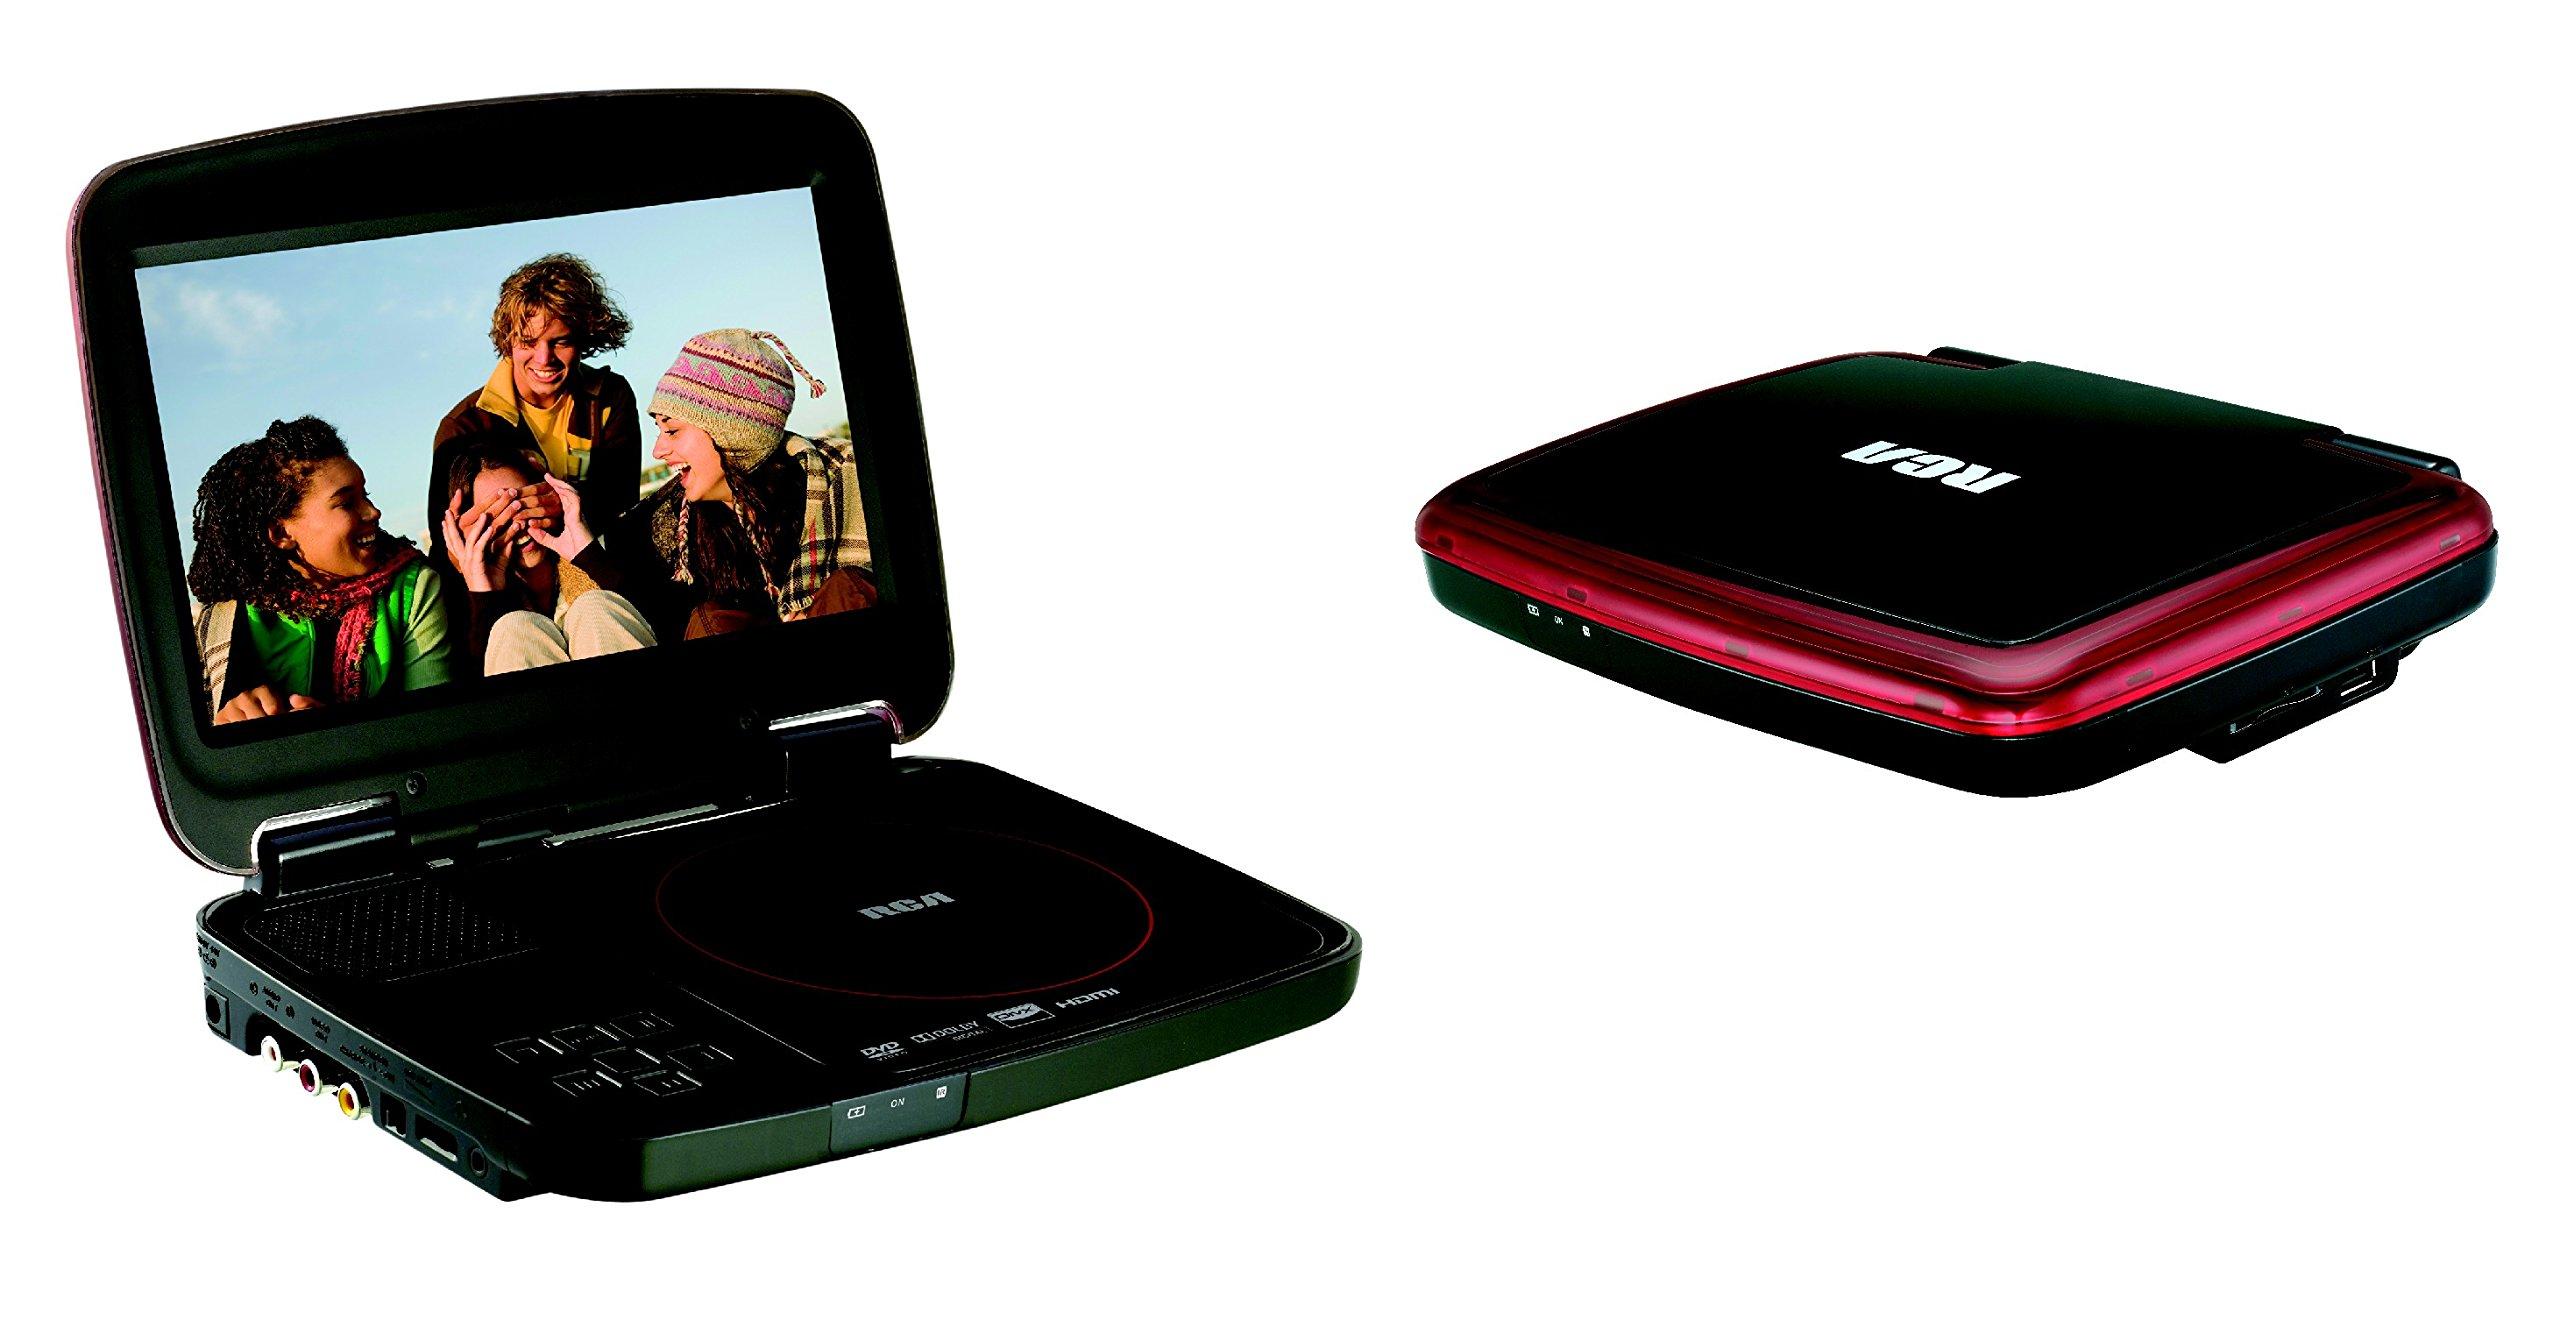 RCA (DRC99380U) 8'' Portable Multimedia CD/DVD Player - USB Flash and SD Card Slot (DivX-Video Certified)